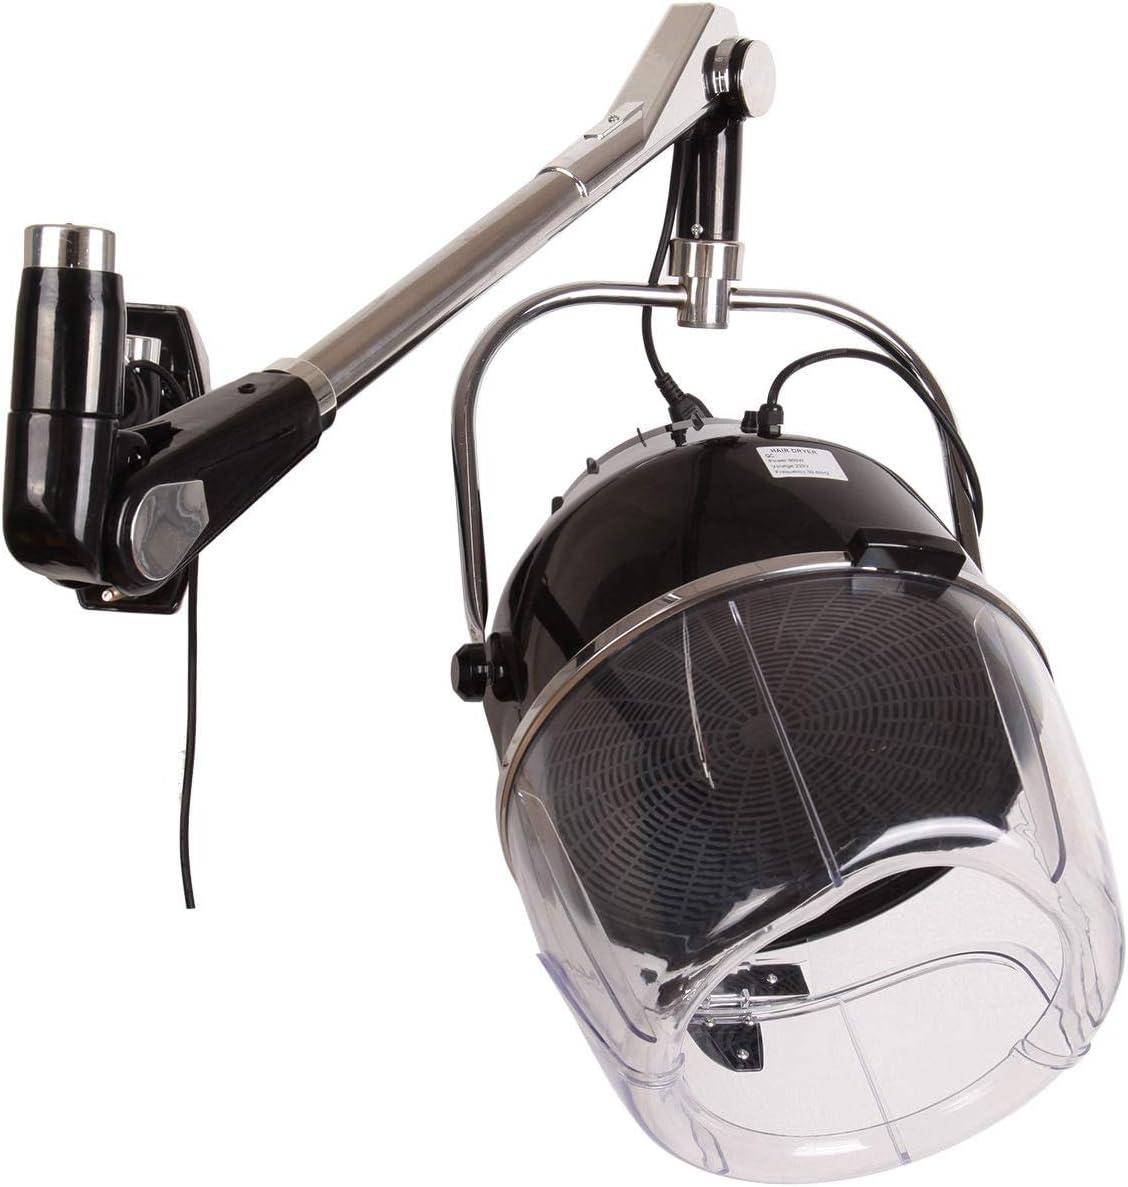 Ridgeyard Mounted Hair Dryer - hooded hair dryers for home